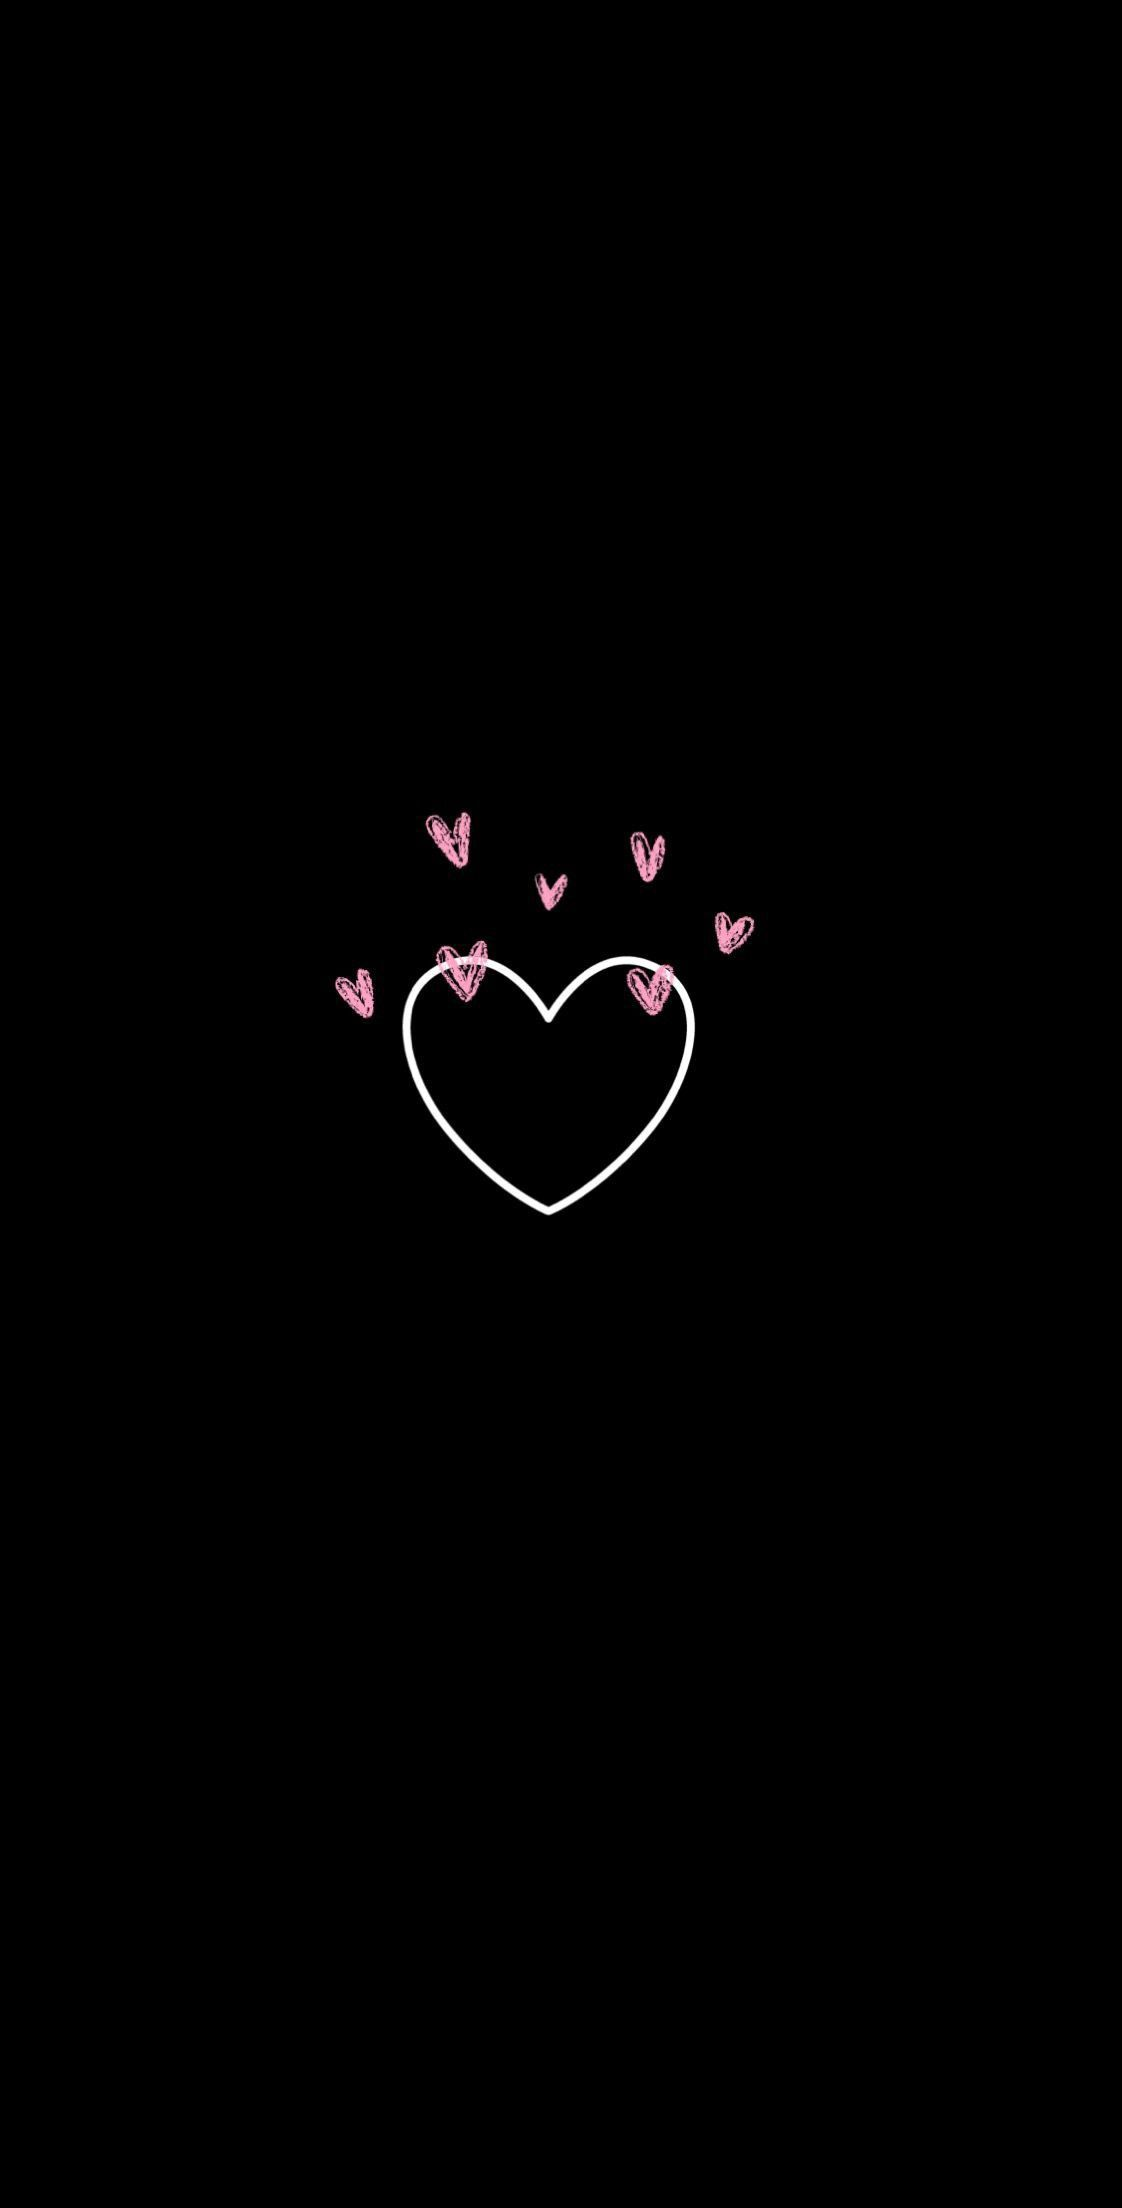 Pin On Imagens Fofas Heart emoji iphone black love wallpaper